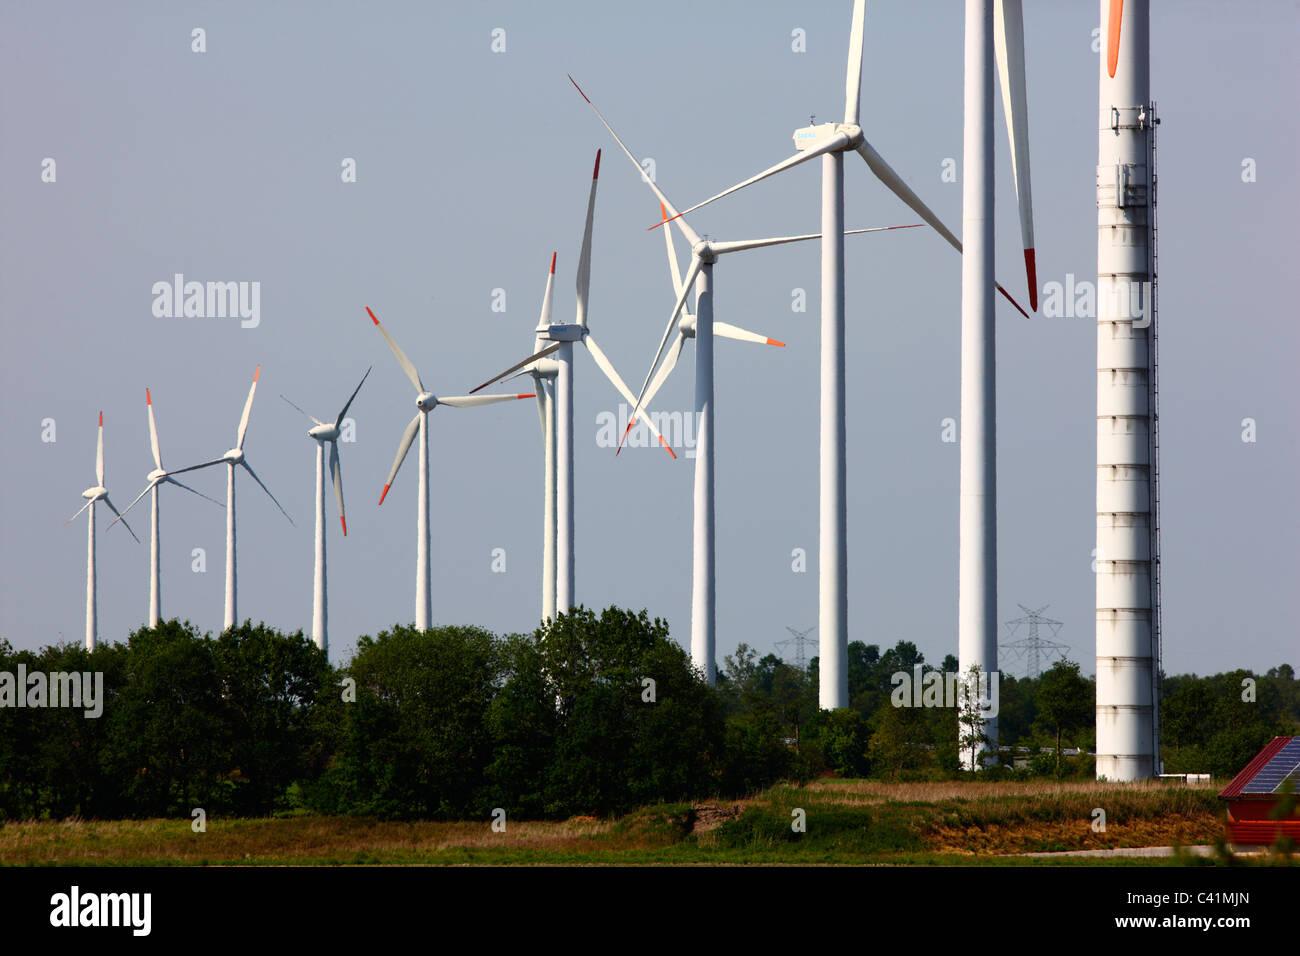 Parco eolico lungo l'autostrada A 31vicino a Rhede, Germania. Immagini Stock